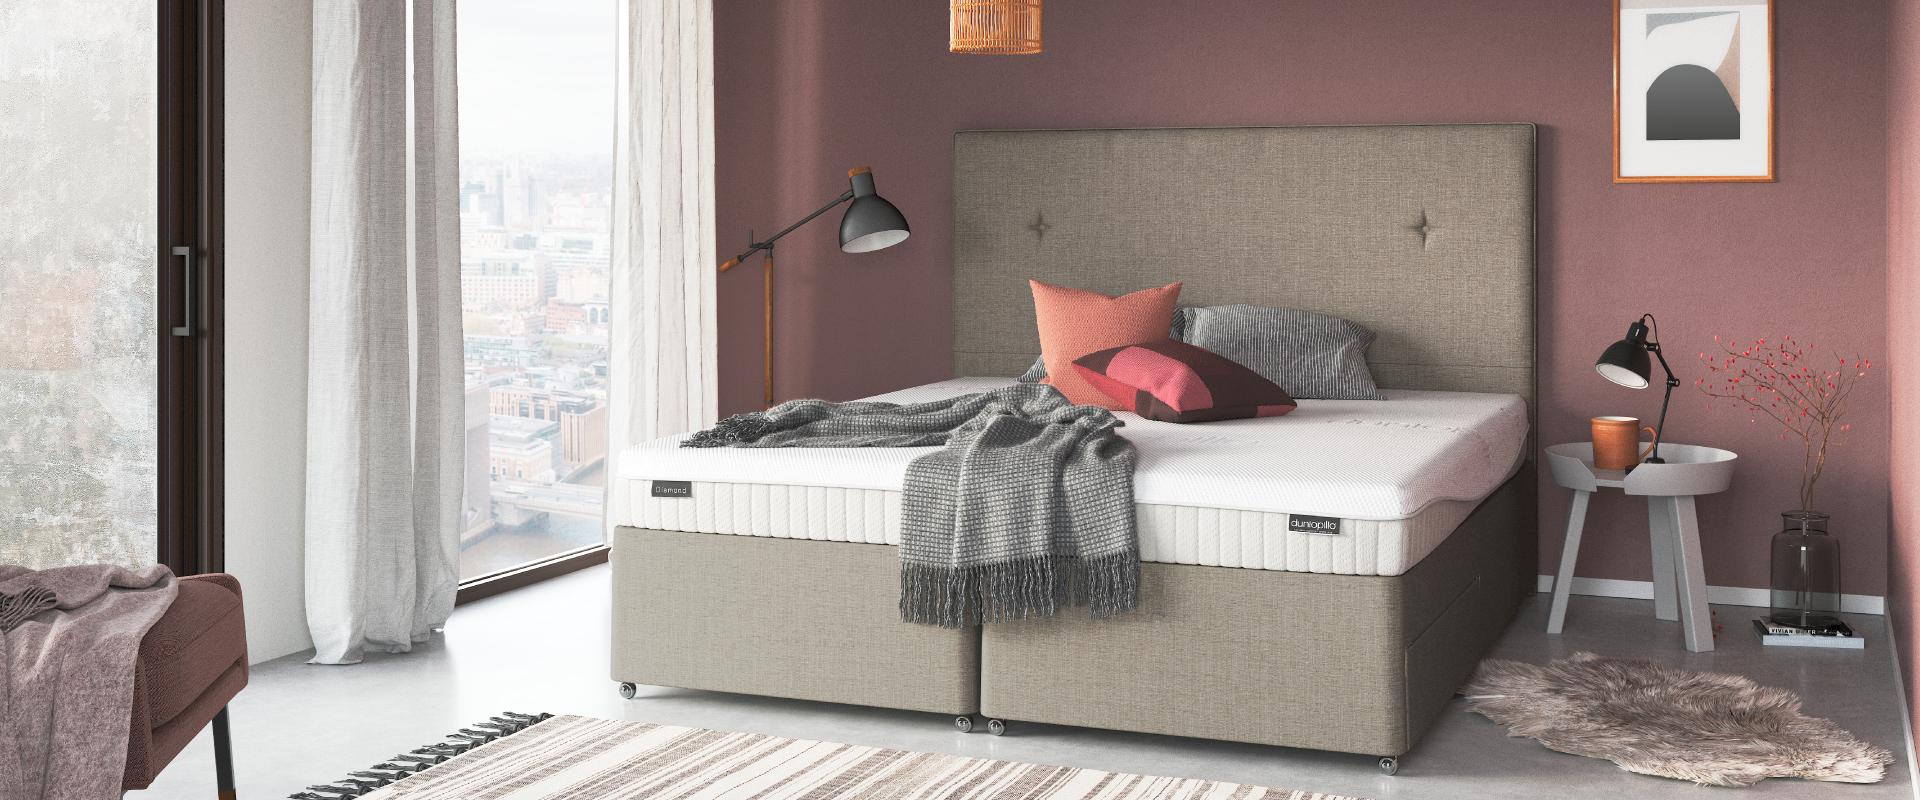 The Bed Shop Alfreton Sofa Beds Dunlopillo Folding